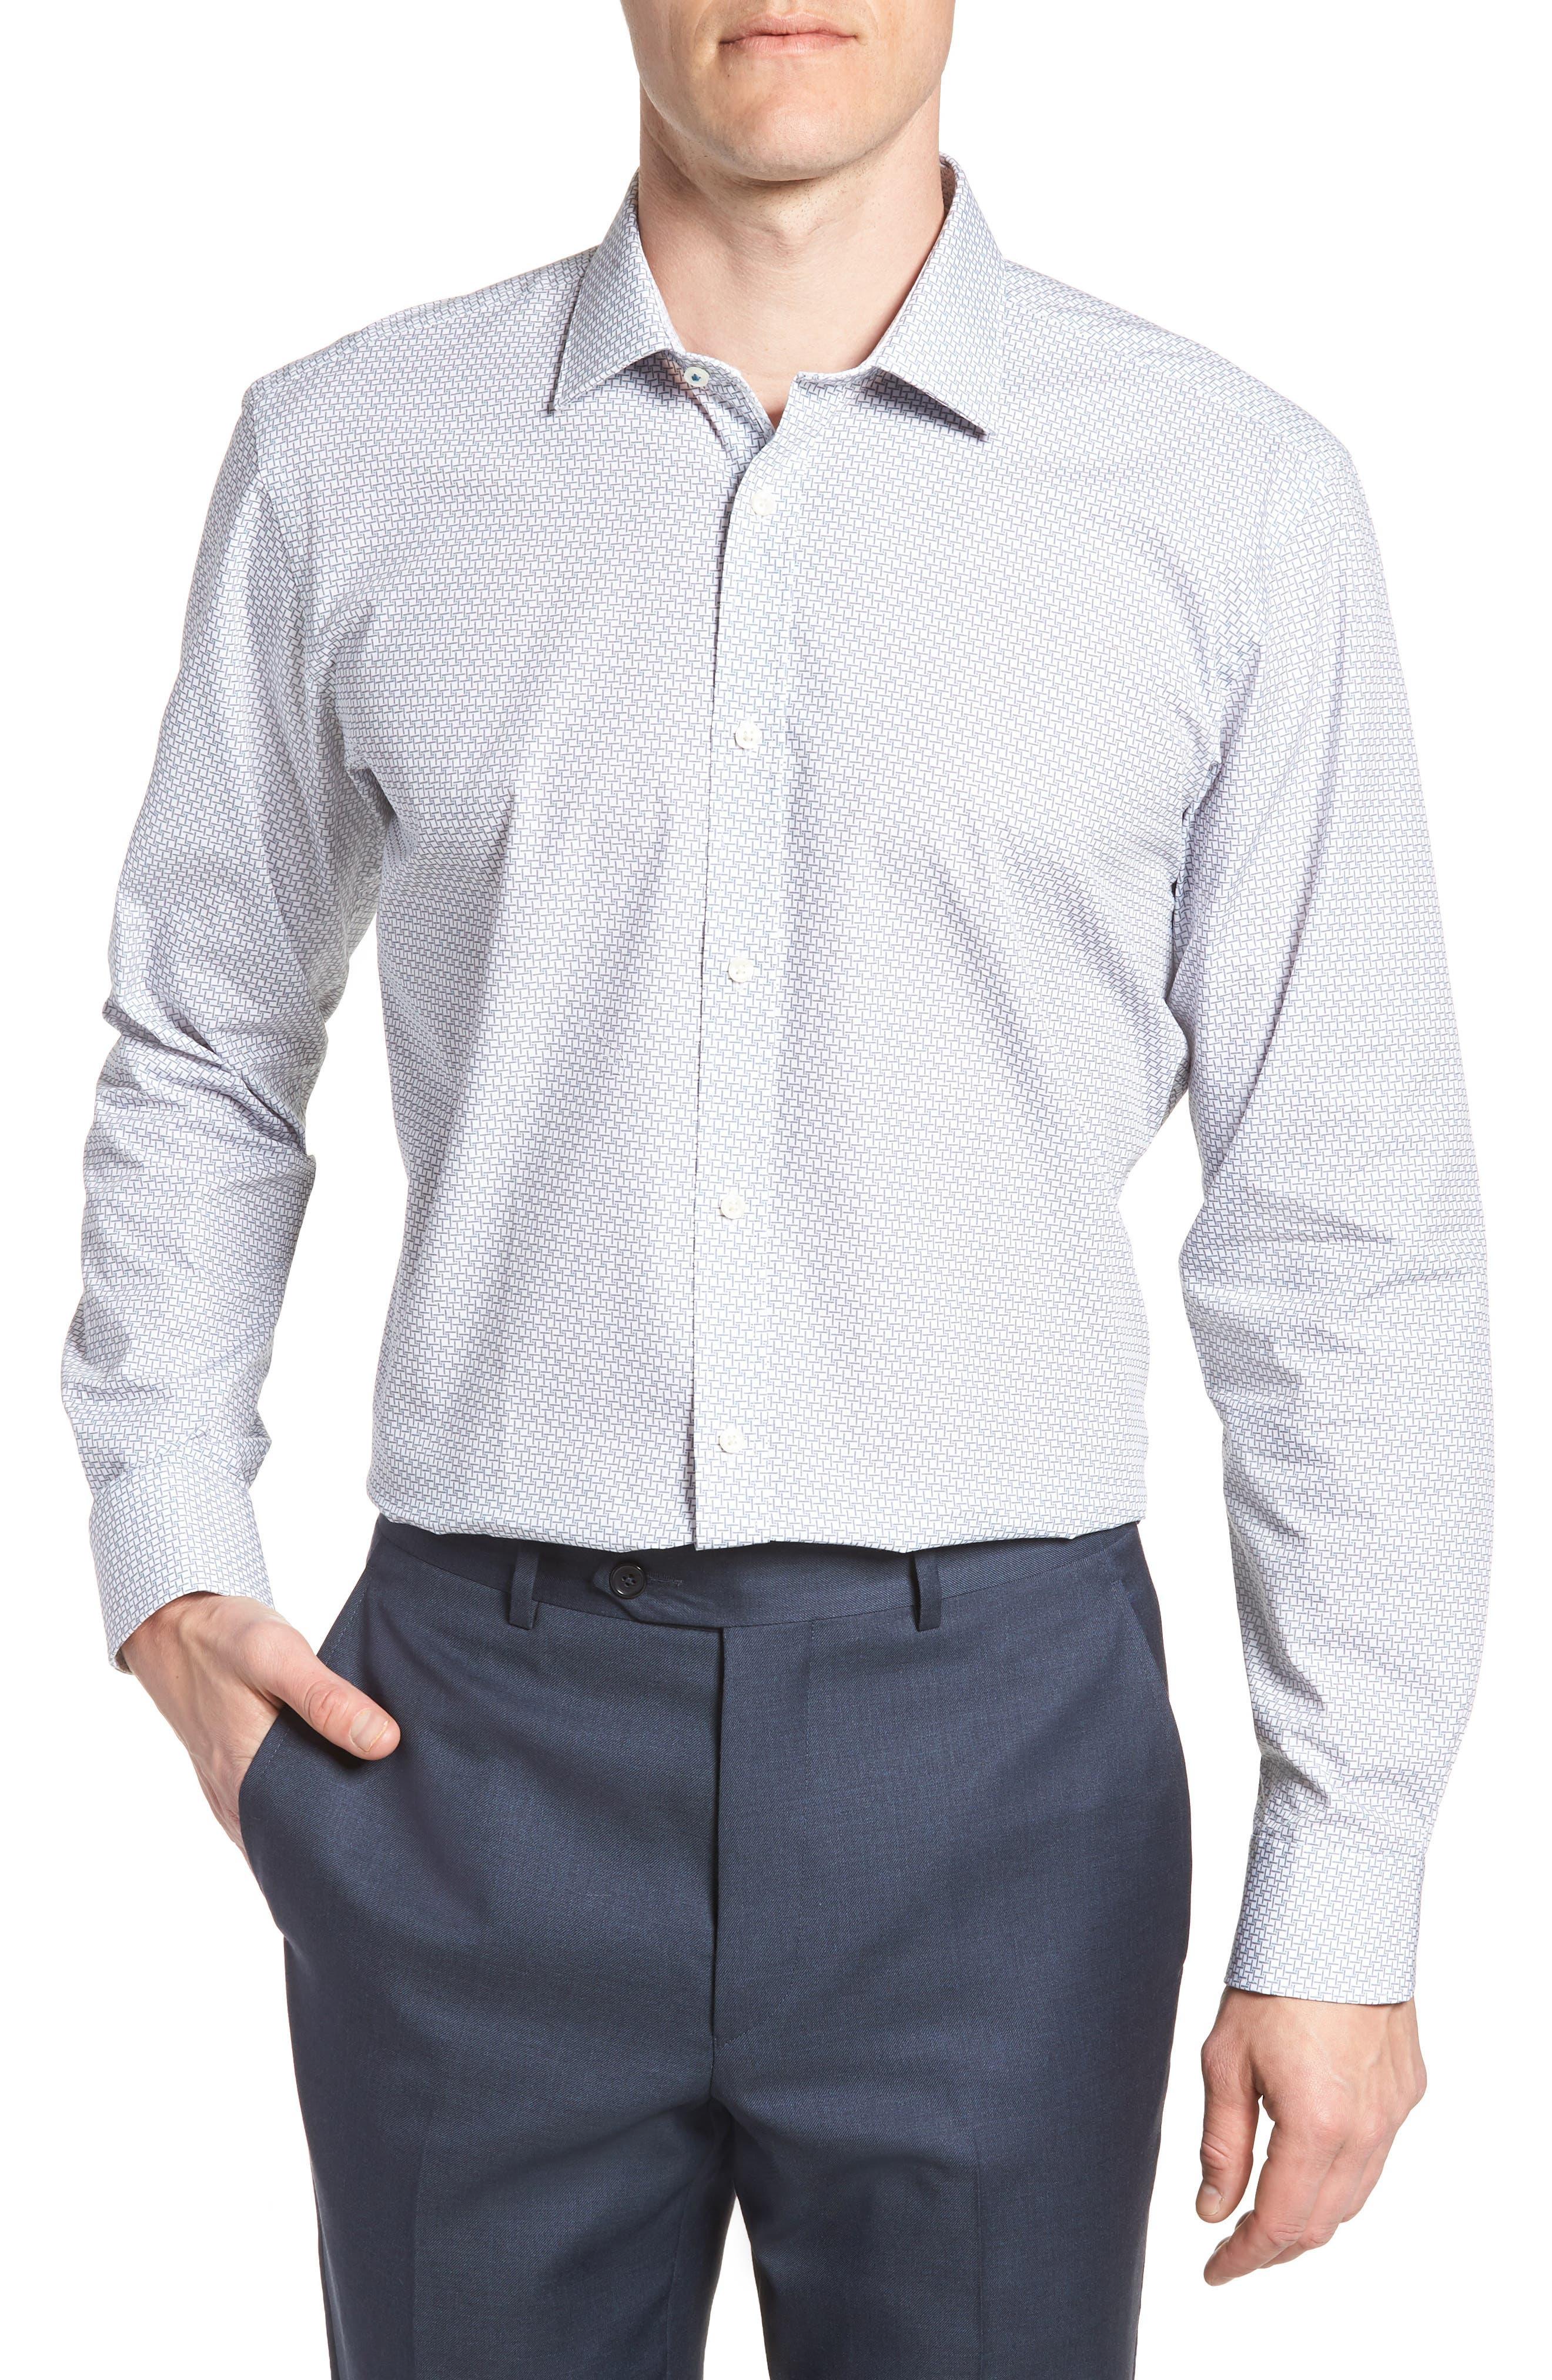 Rosprim Trim Fit Geometric Dress Shirt,                         Main,                         color, GREY